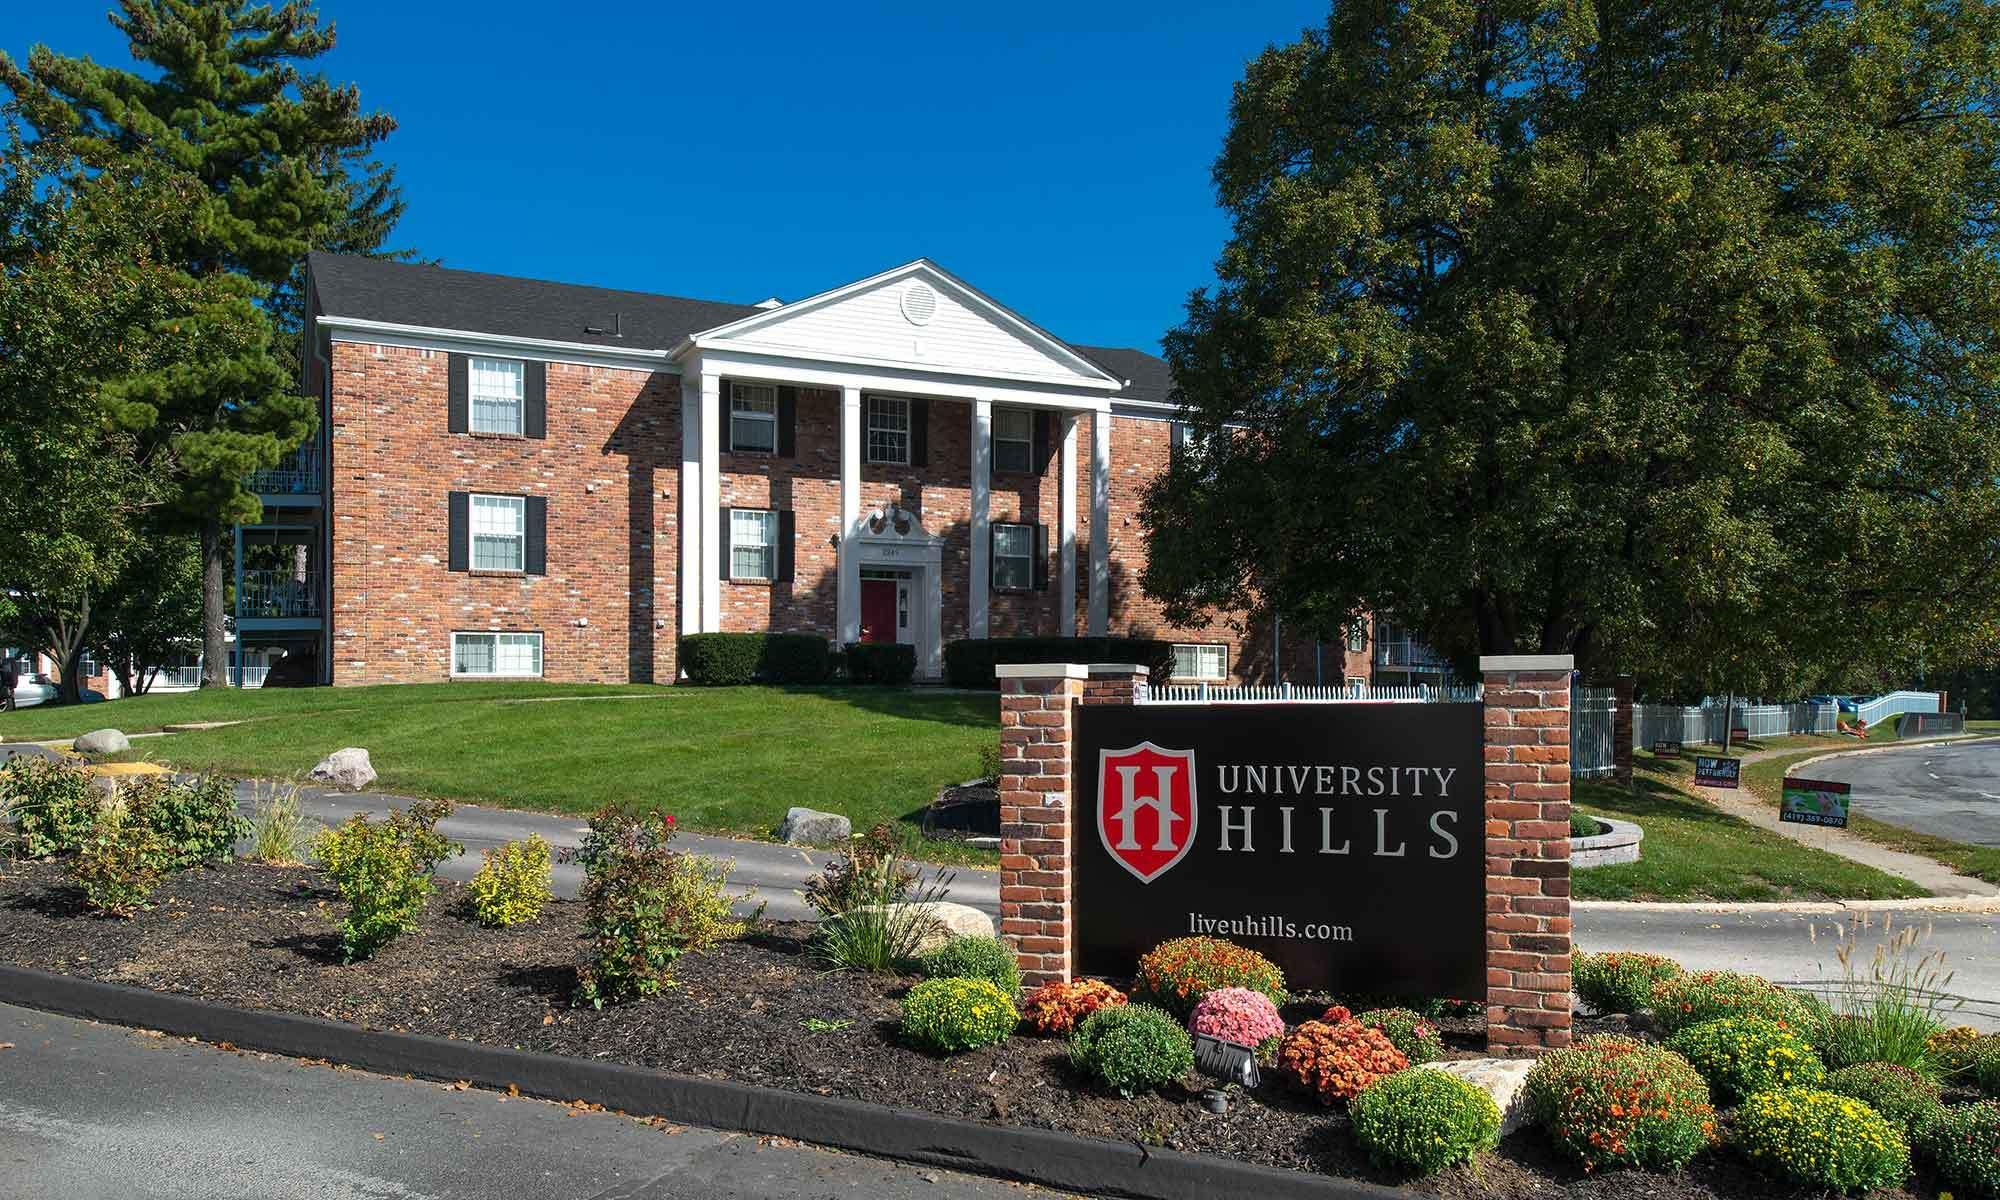 University Hills Off Campus Student Housing In Toledo Oh